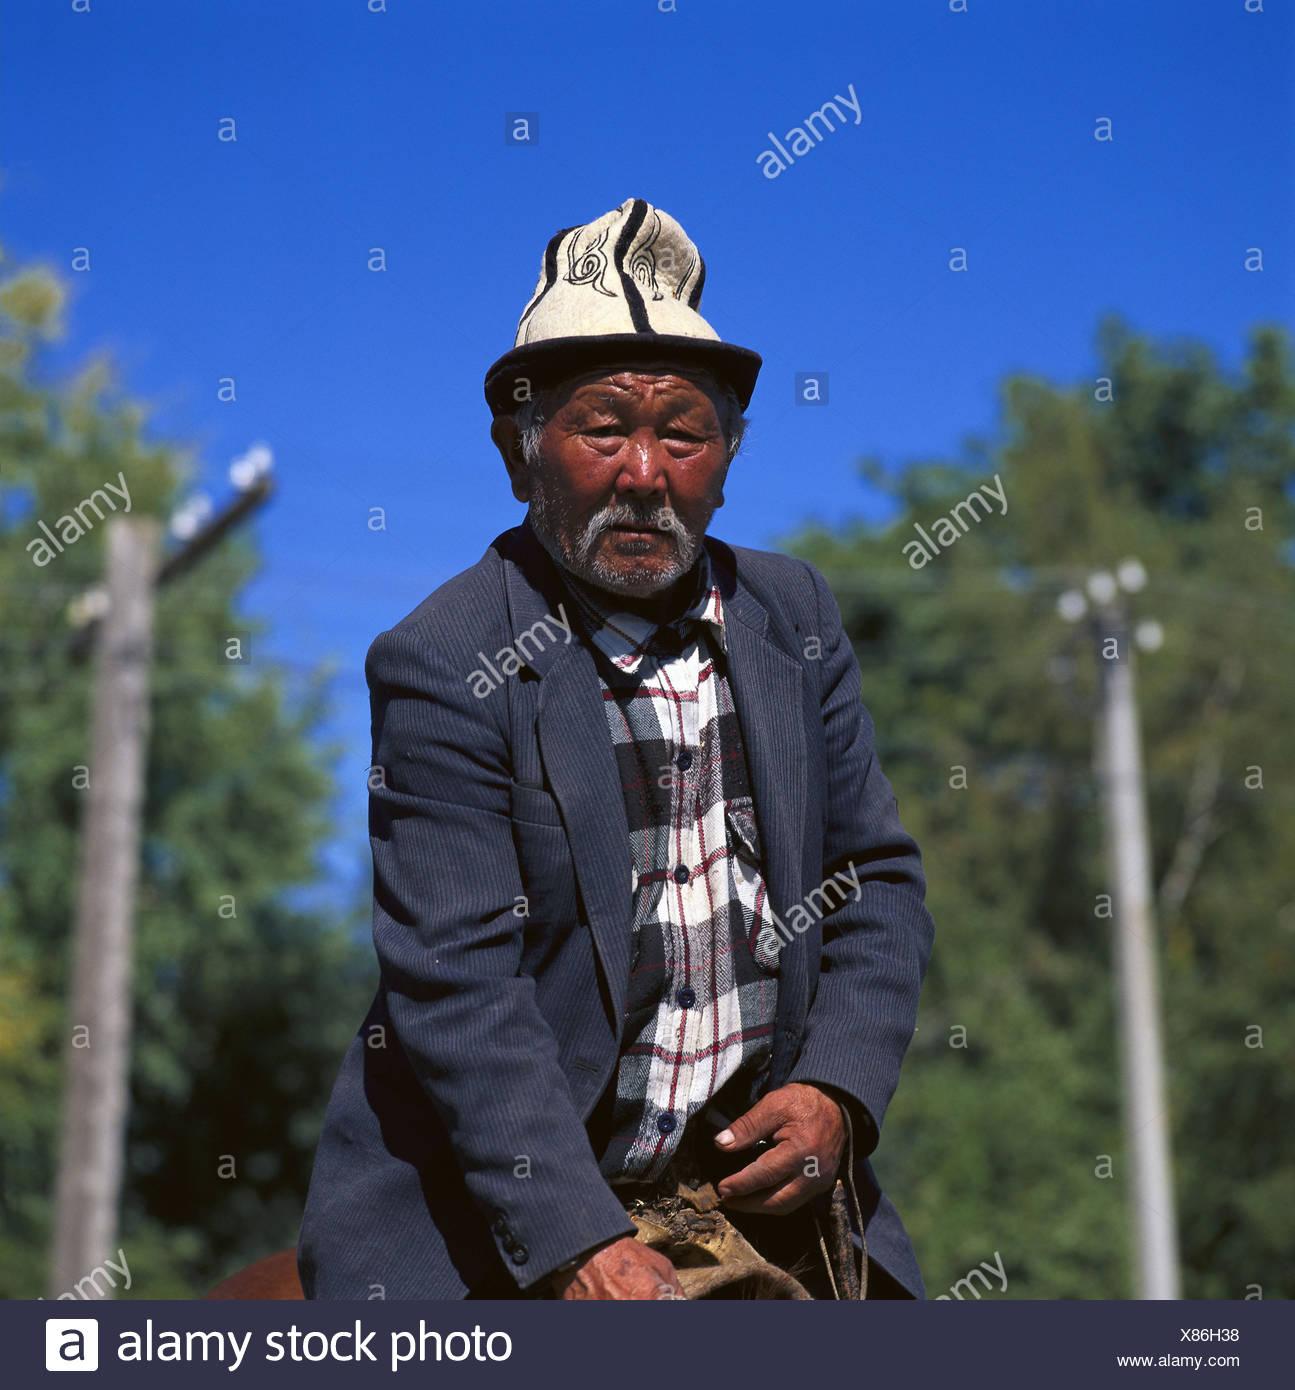 b8ae884ee Dark Skinned Old Man Stock Photos & Dark Skinned Old Man Stock ...